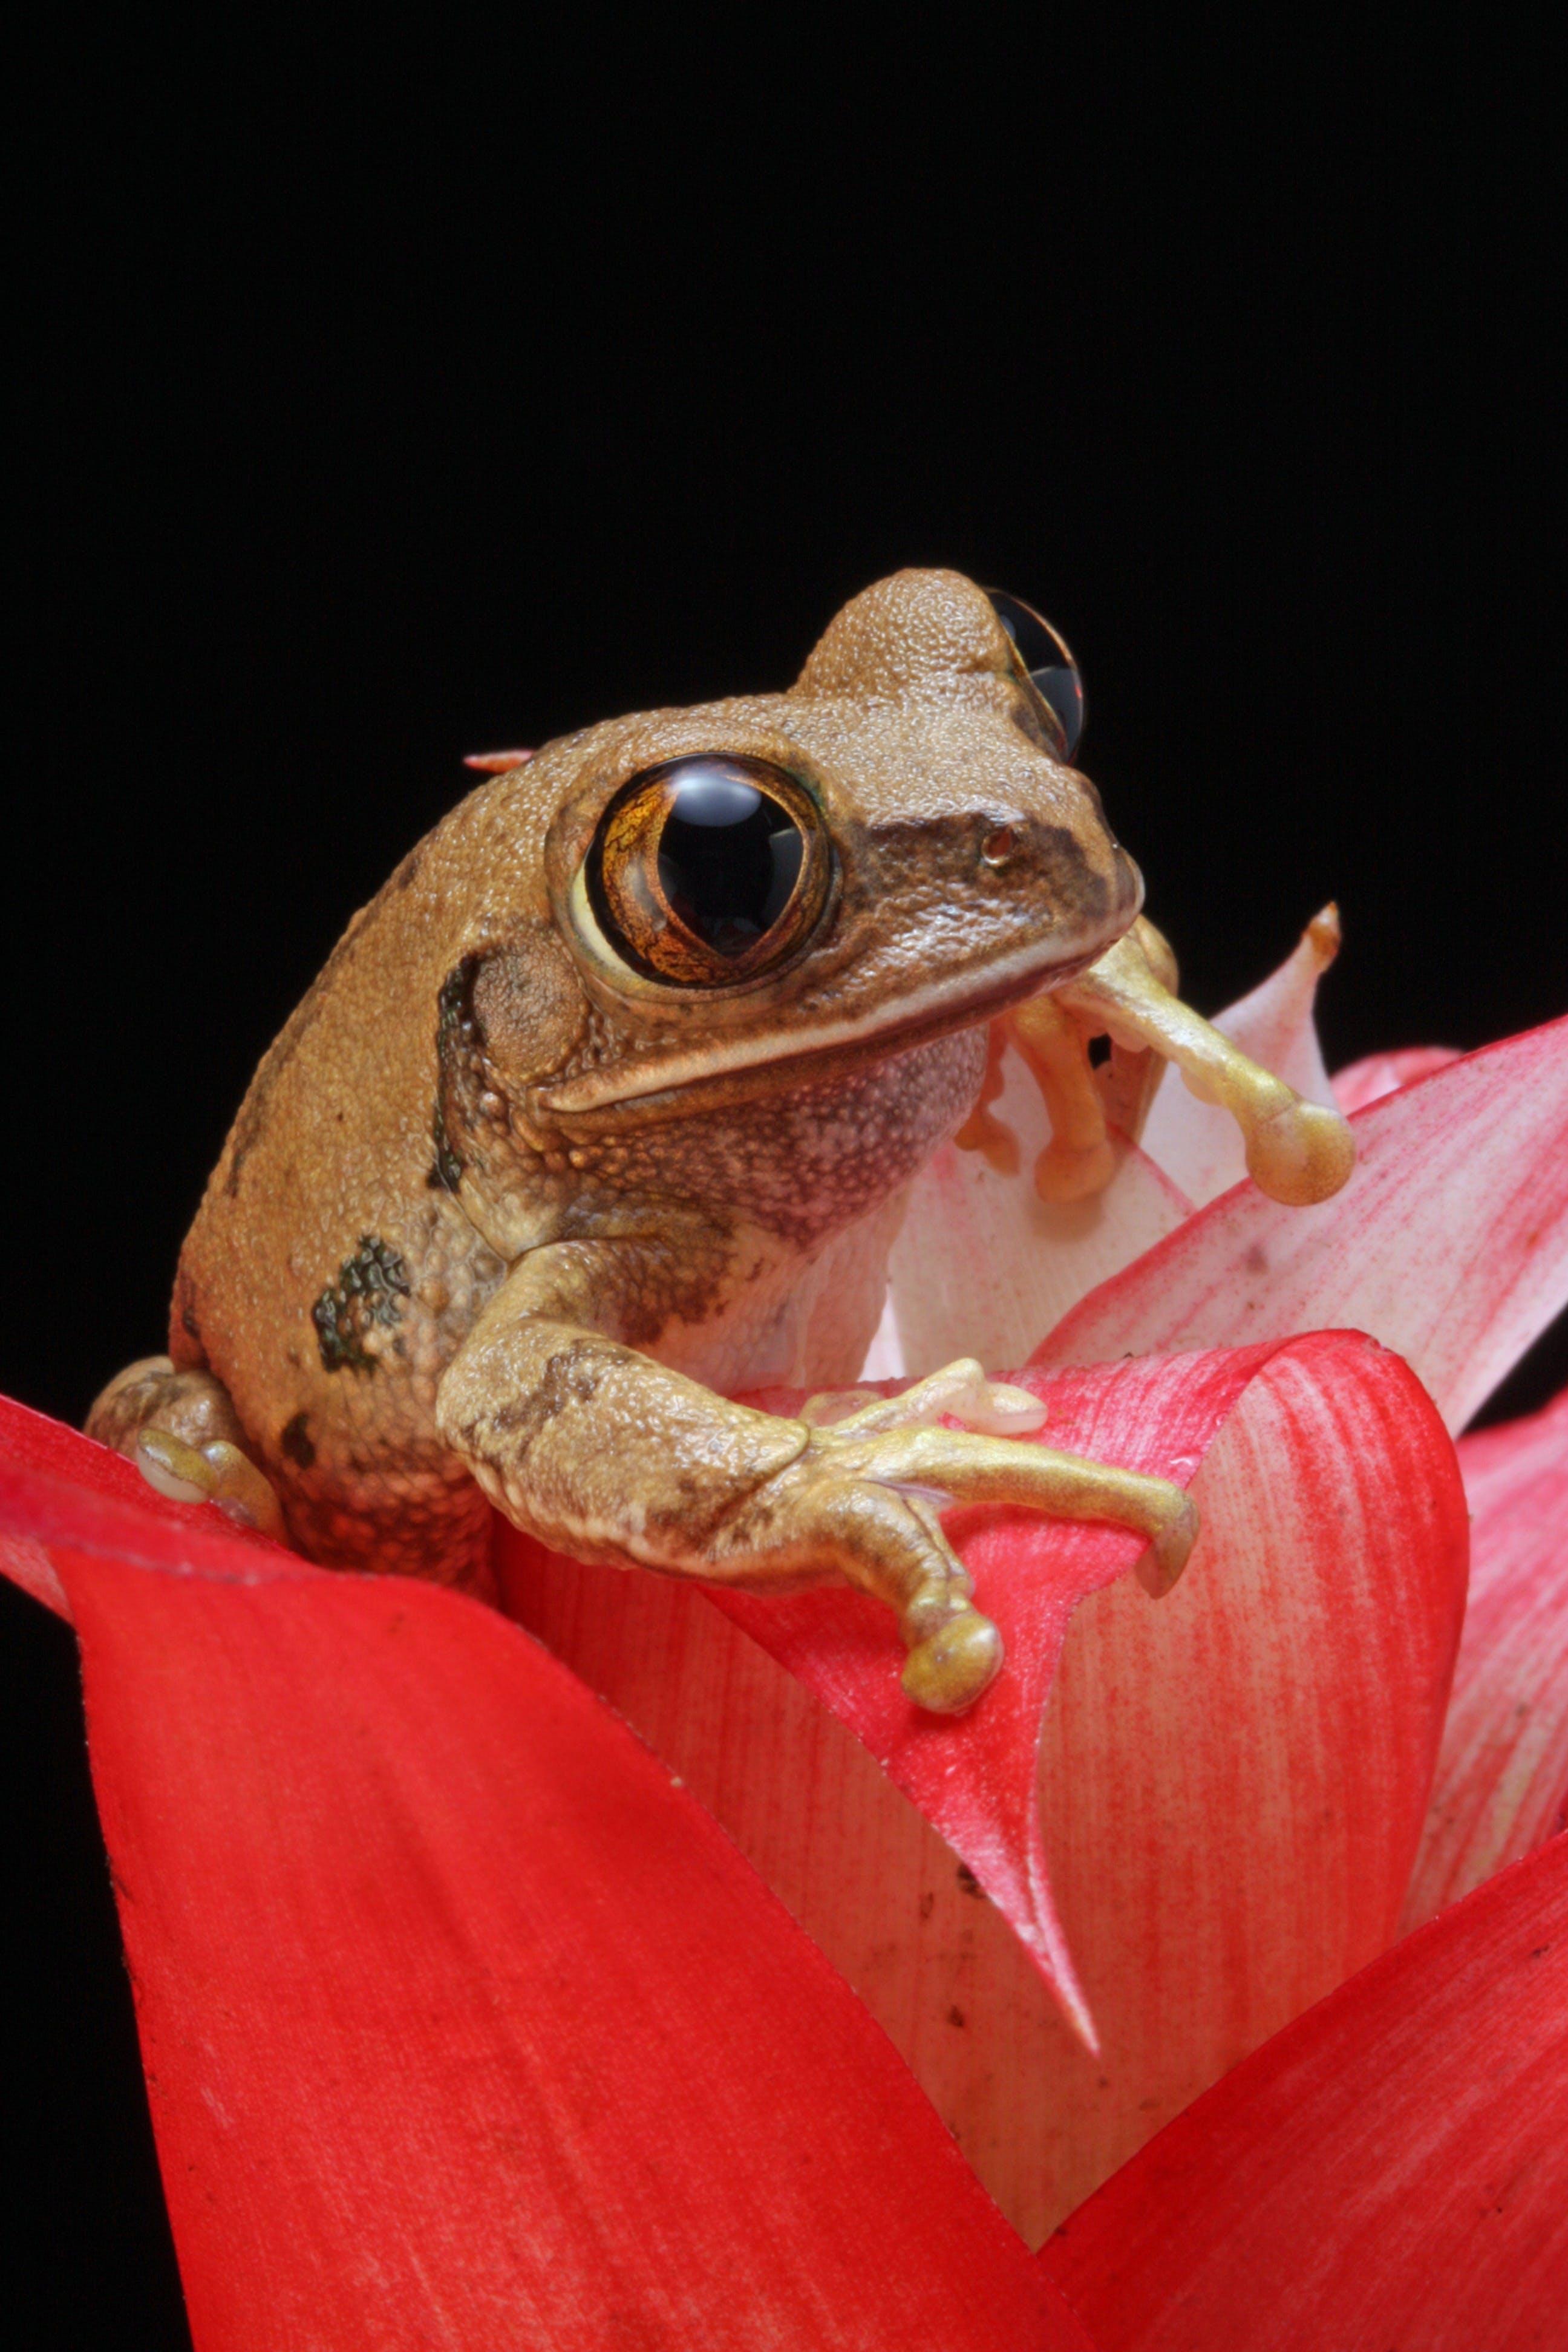 frog-marbled-reed-frog-amphibian-animal-73798.jpeg?auto=compress&cs=tinysrgb&dpr=2&h=200&w=600